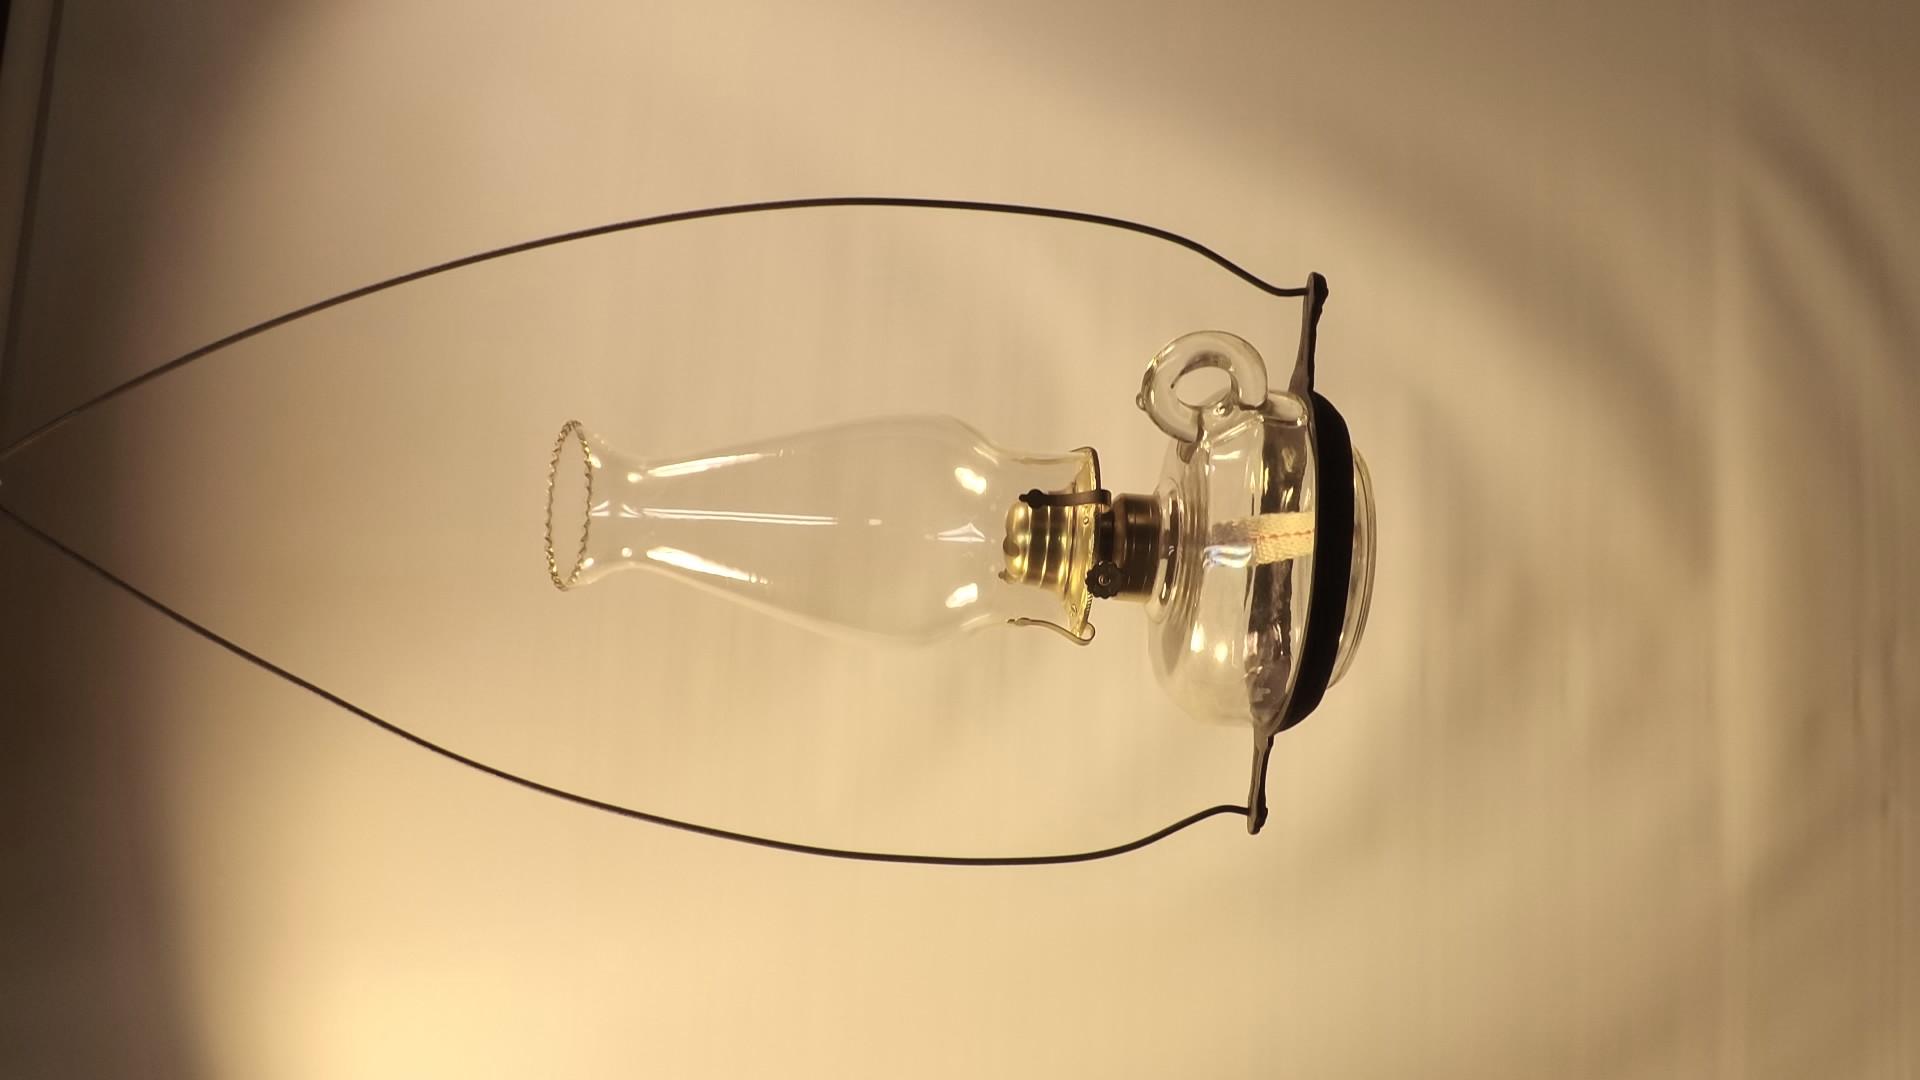 Plain hanging lamp - uses finger lamp font